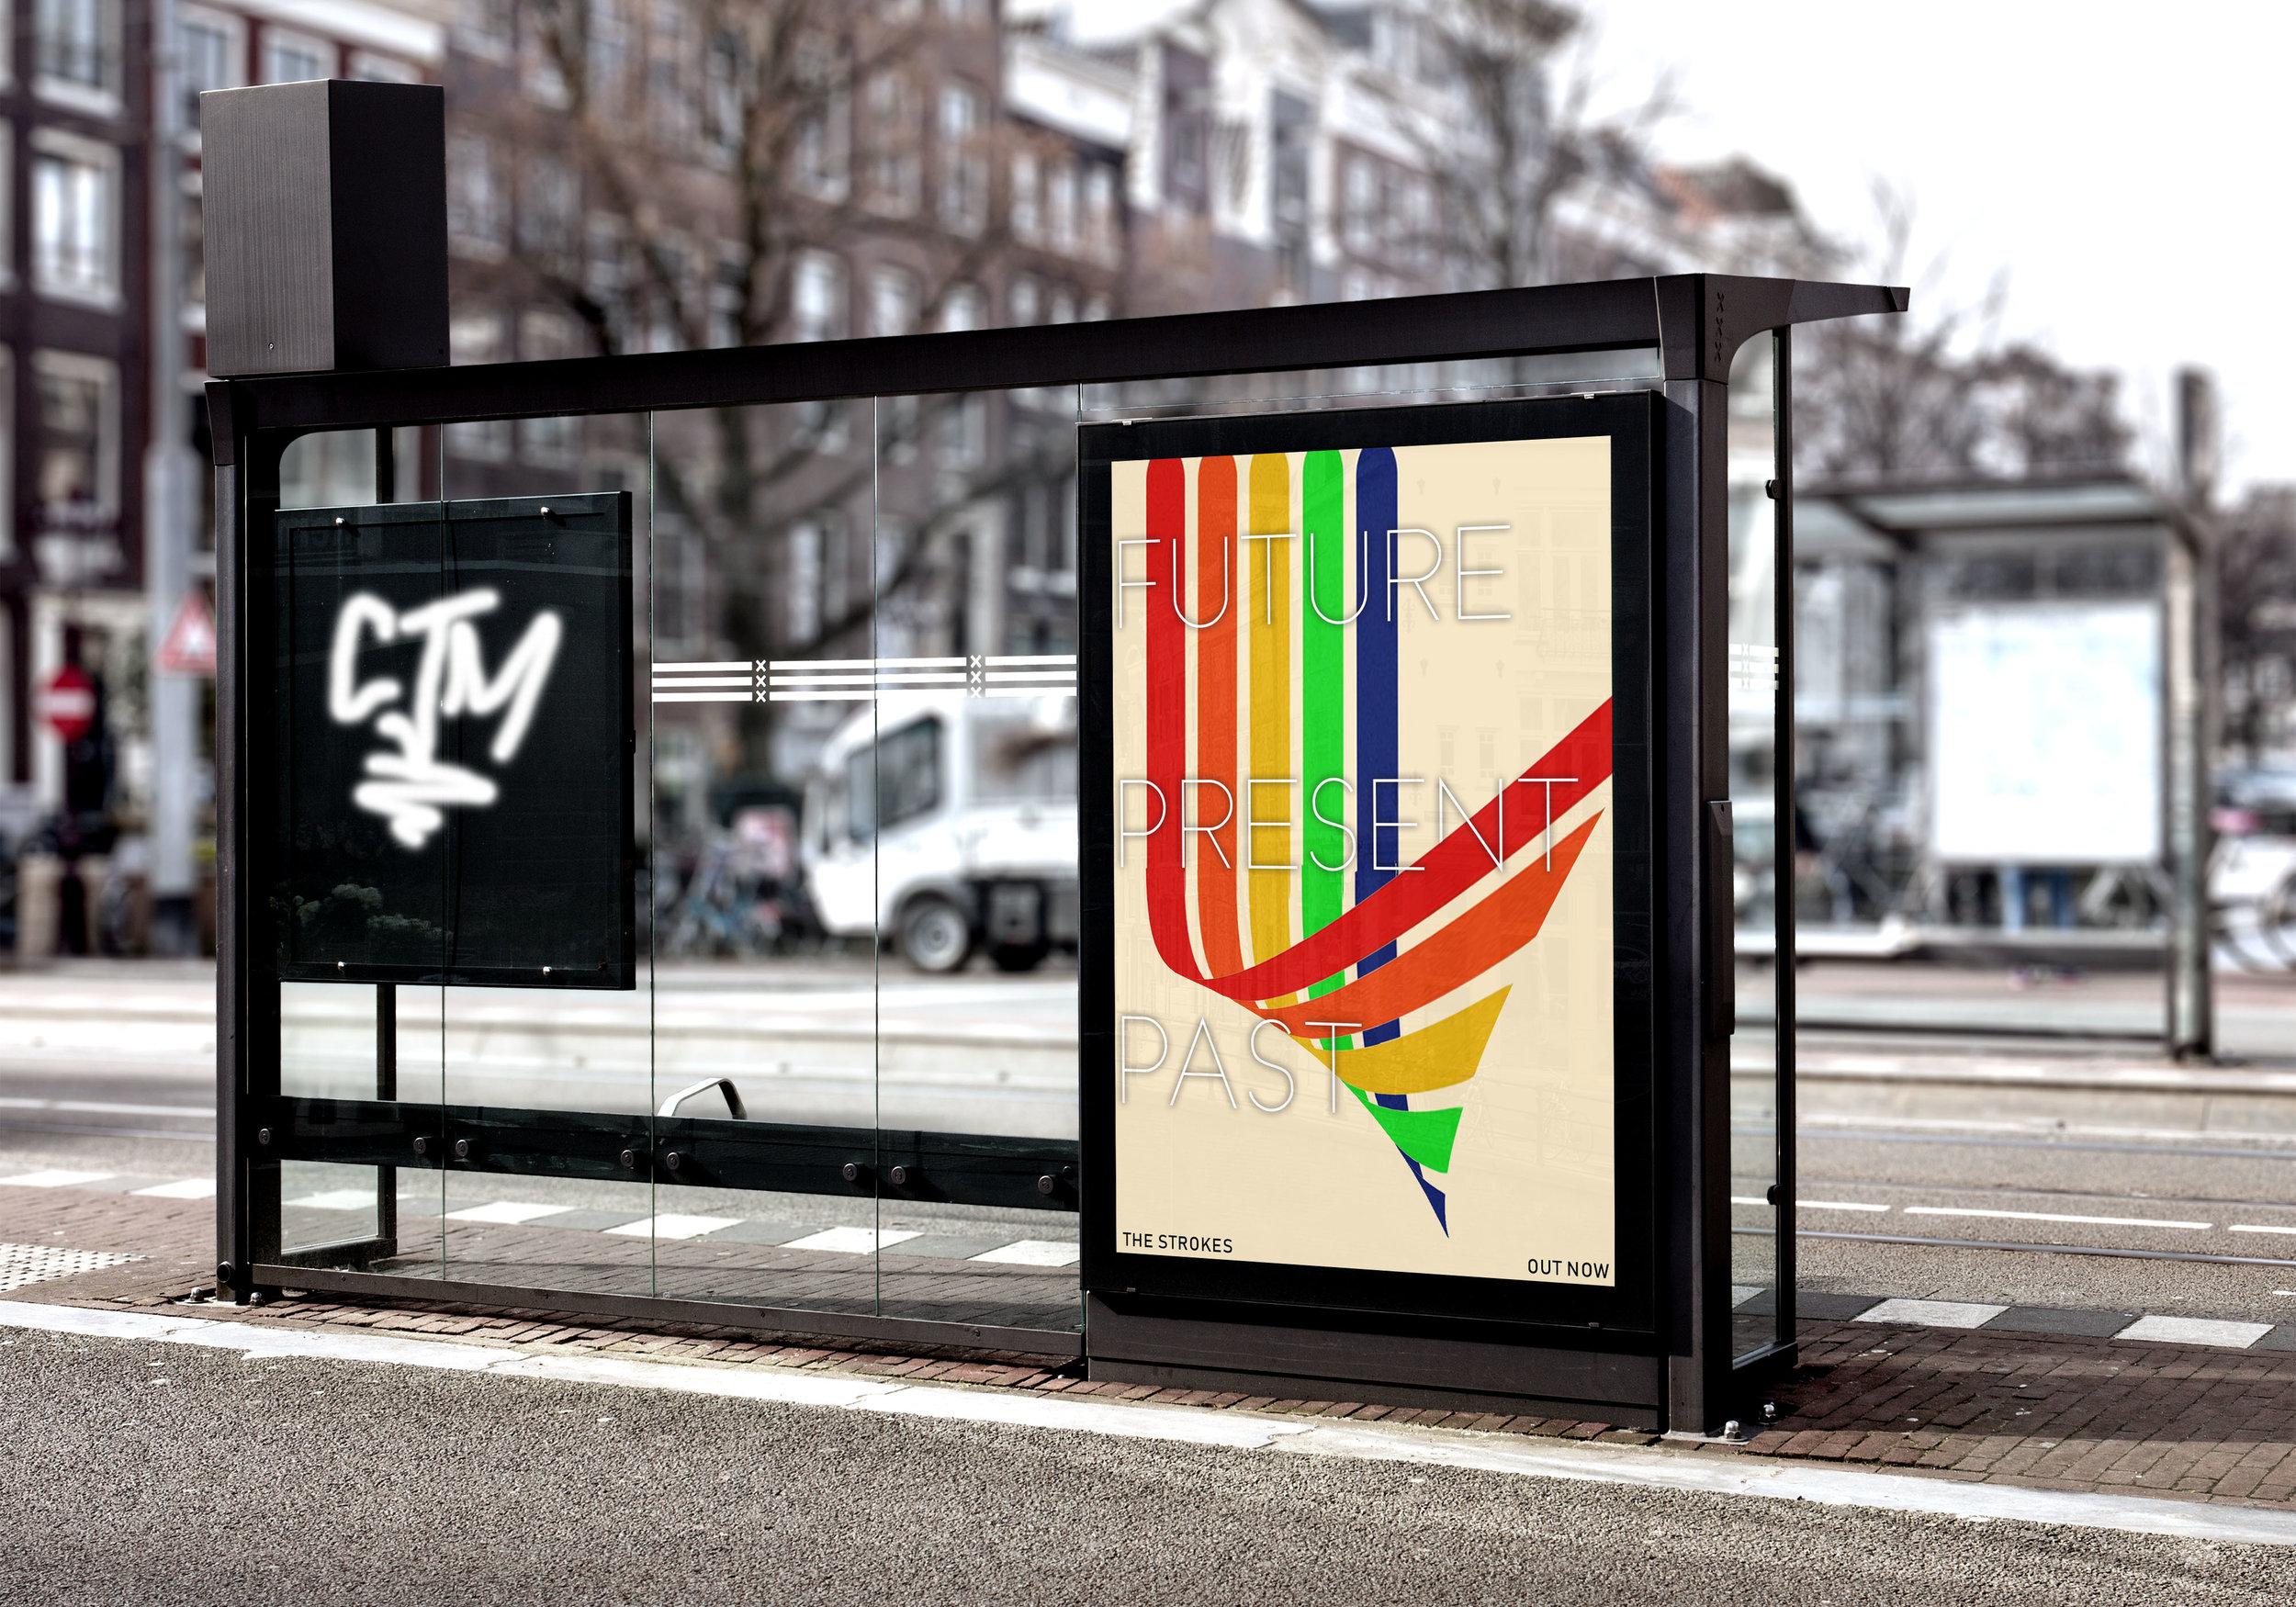 Bus Stop BillboardCM.jpg